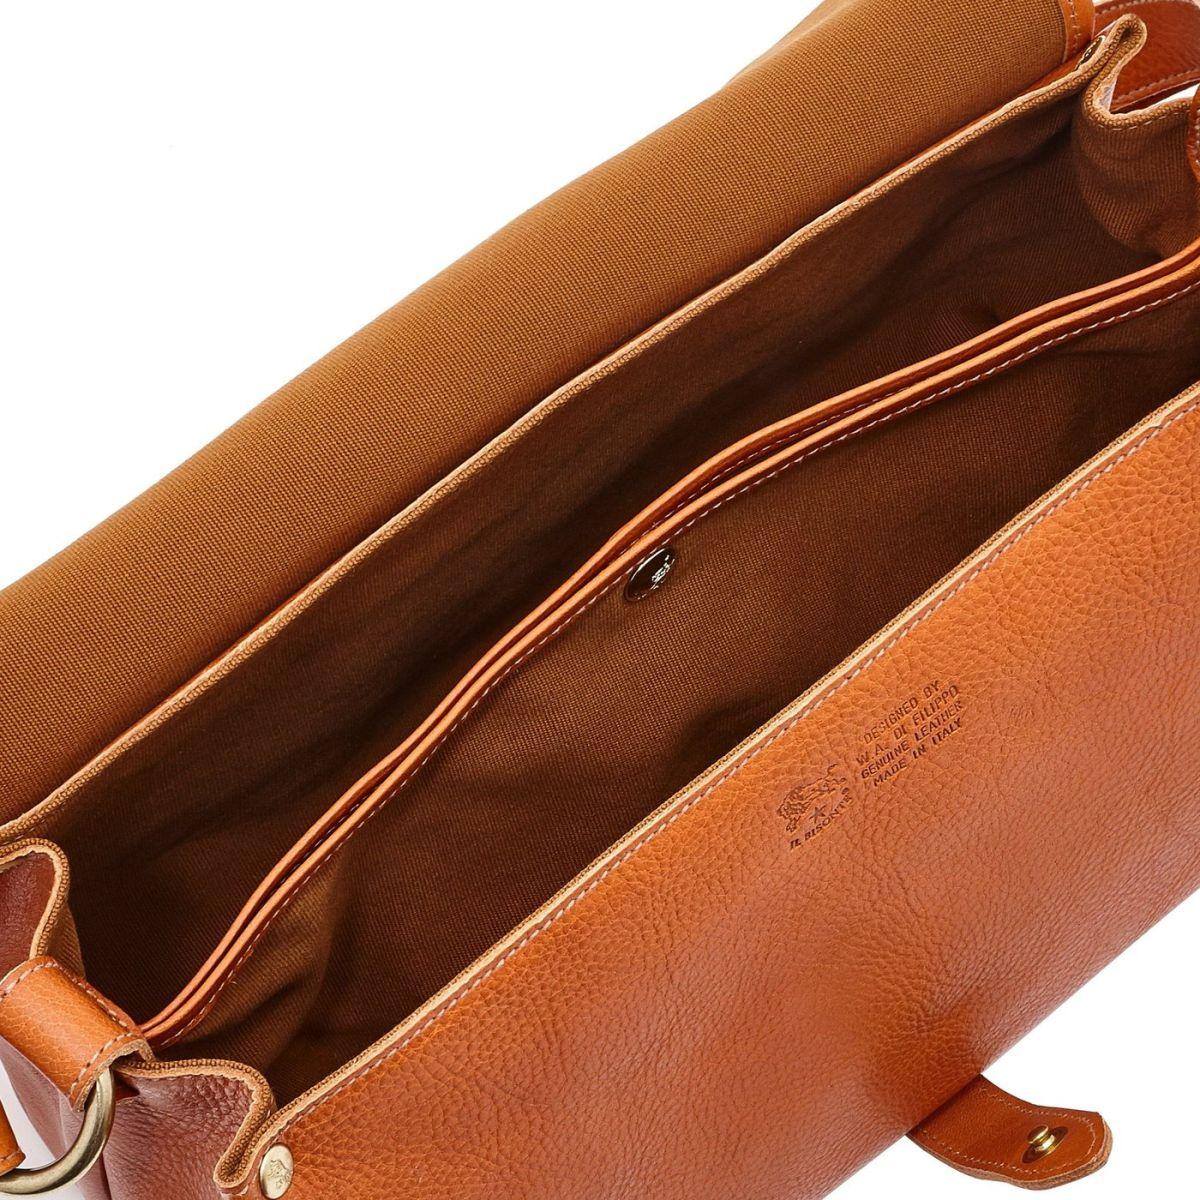 Women's Shoulder Bag in Cowhide Double Leather BSH034 color Caramel | Details